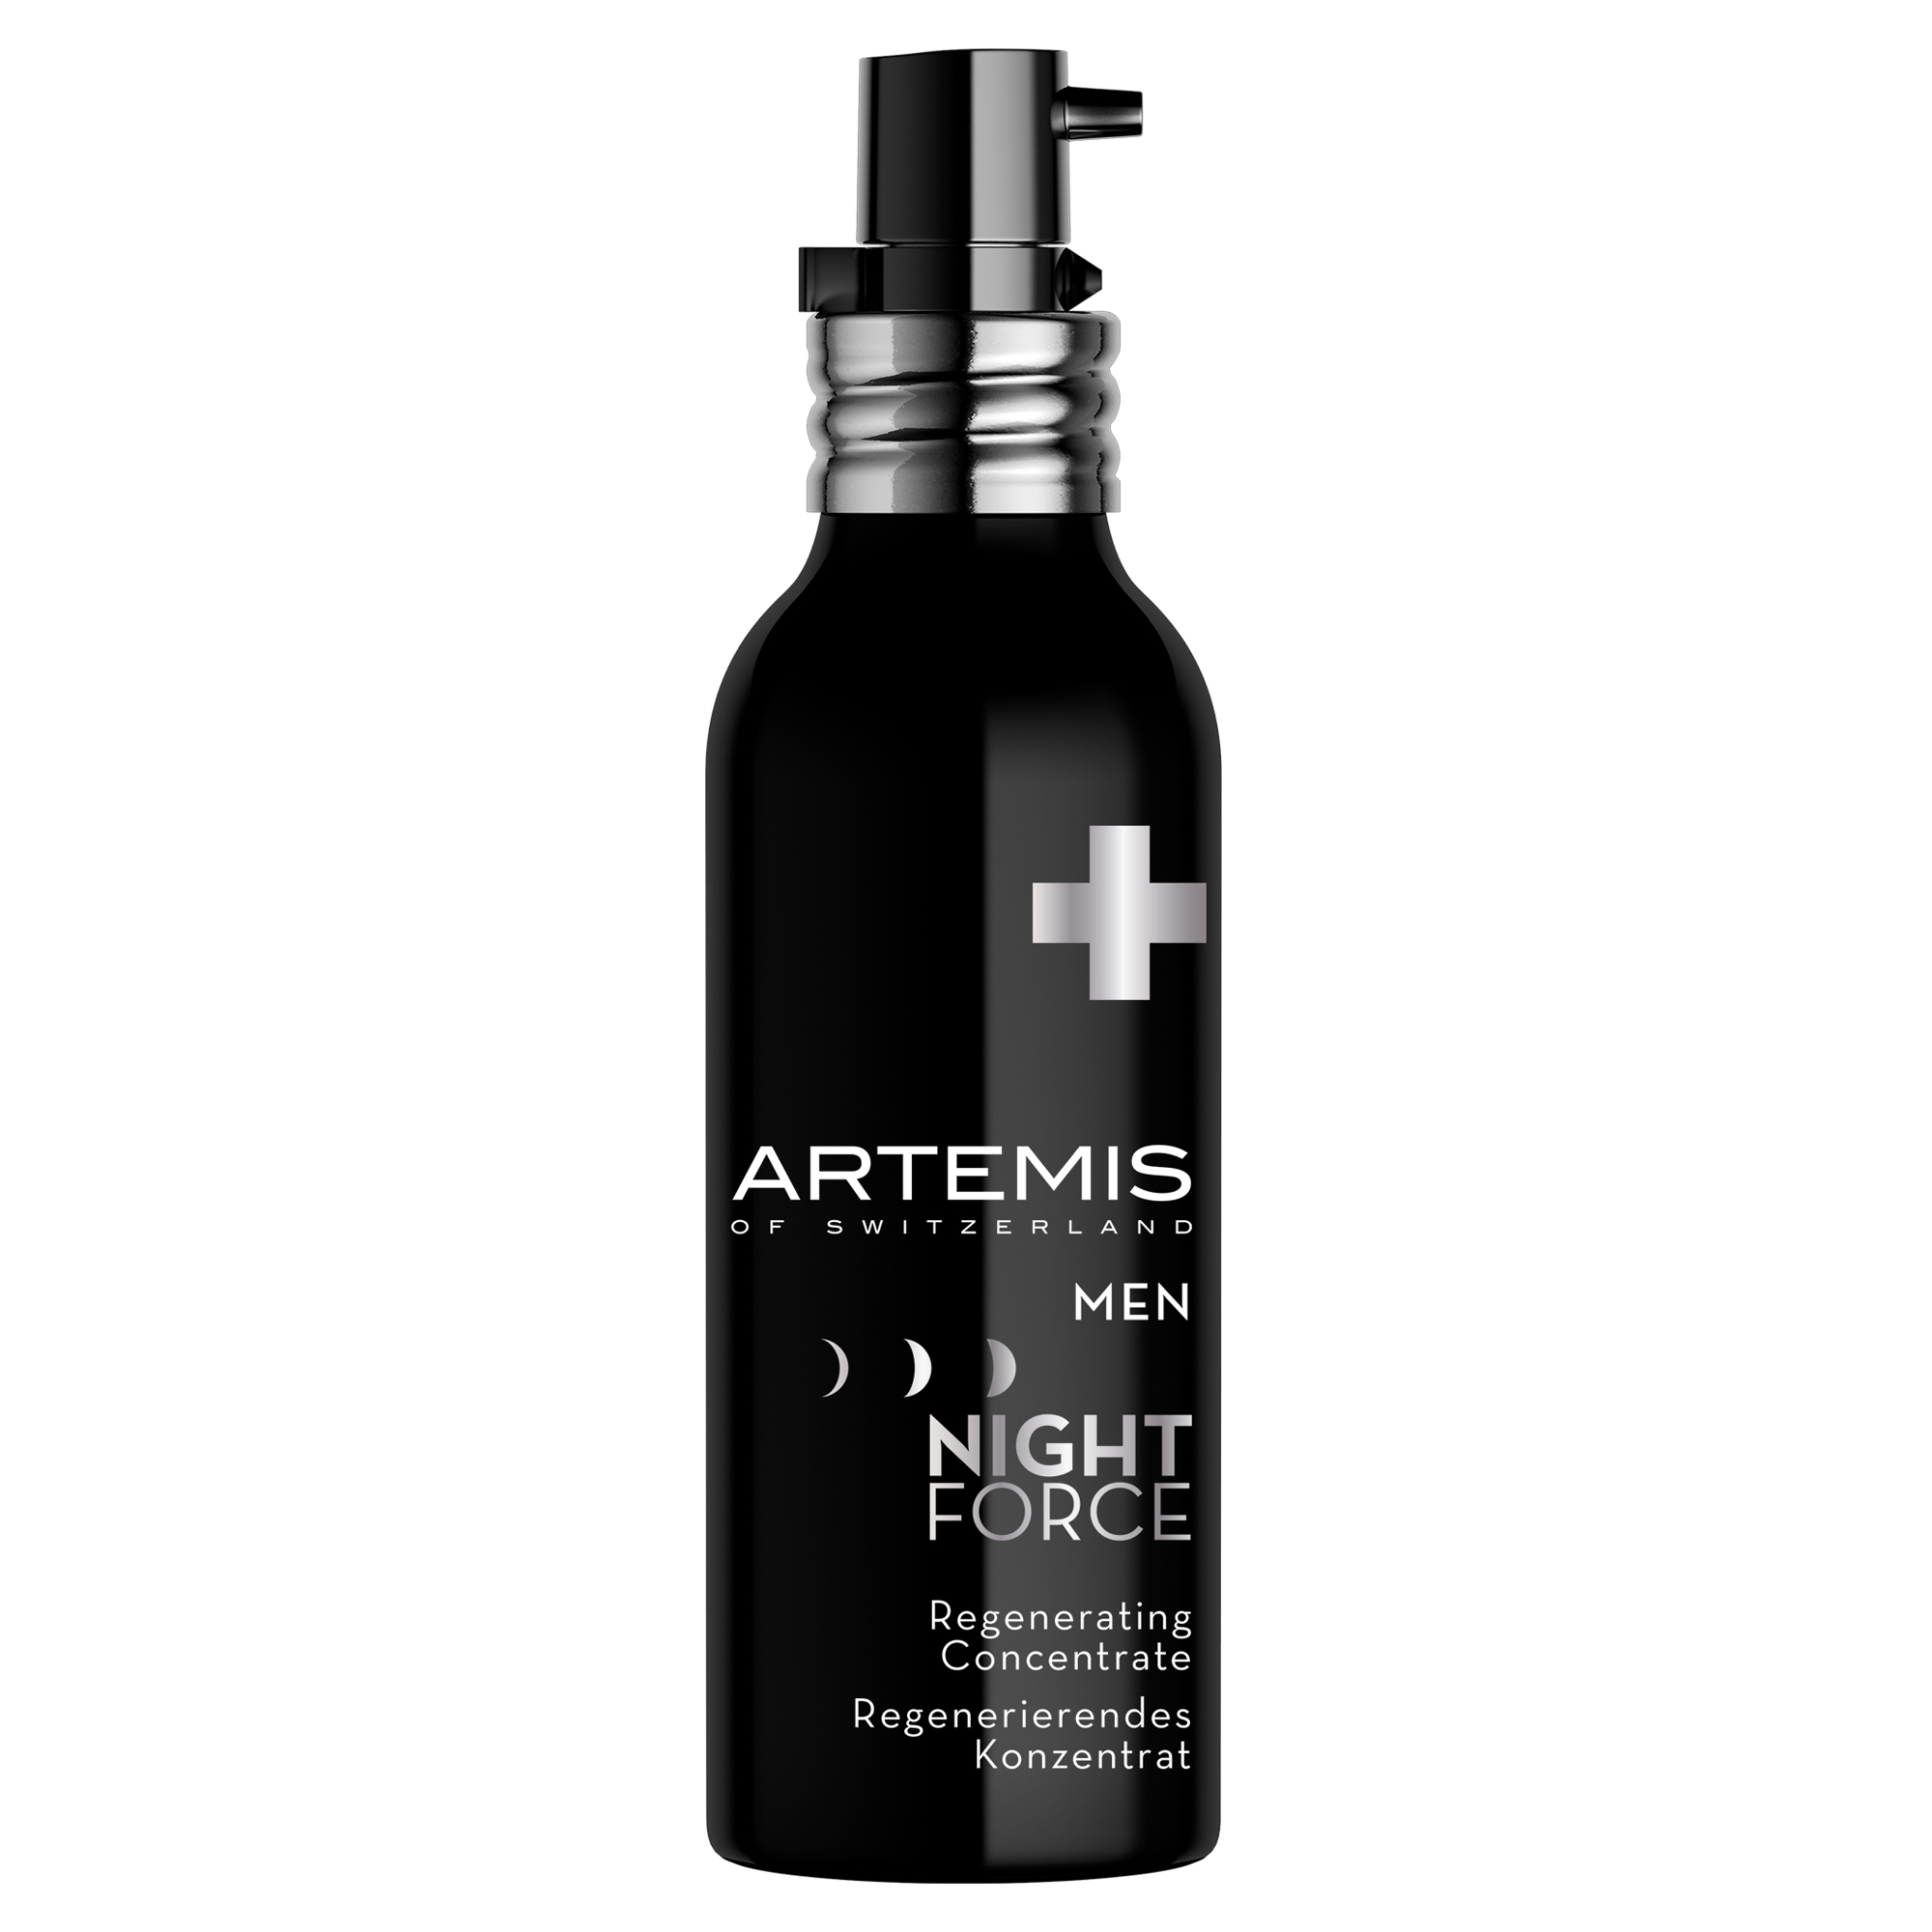 Artemis Men Night Force Concentrate 75ml